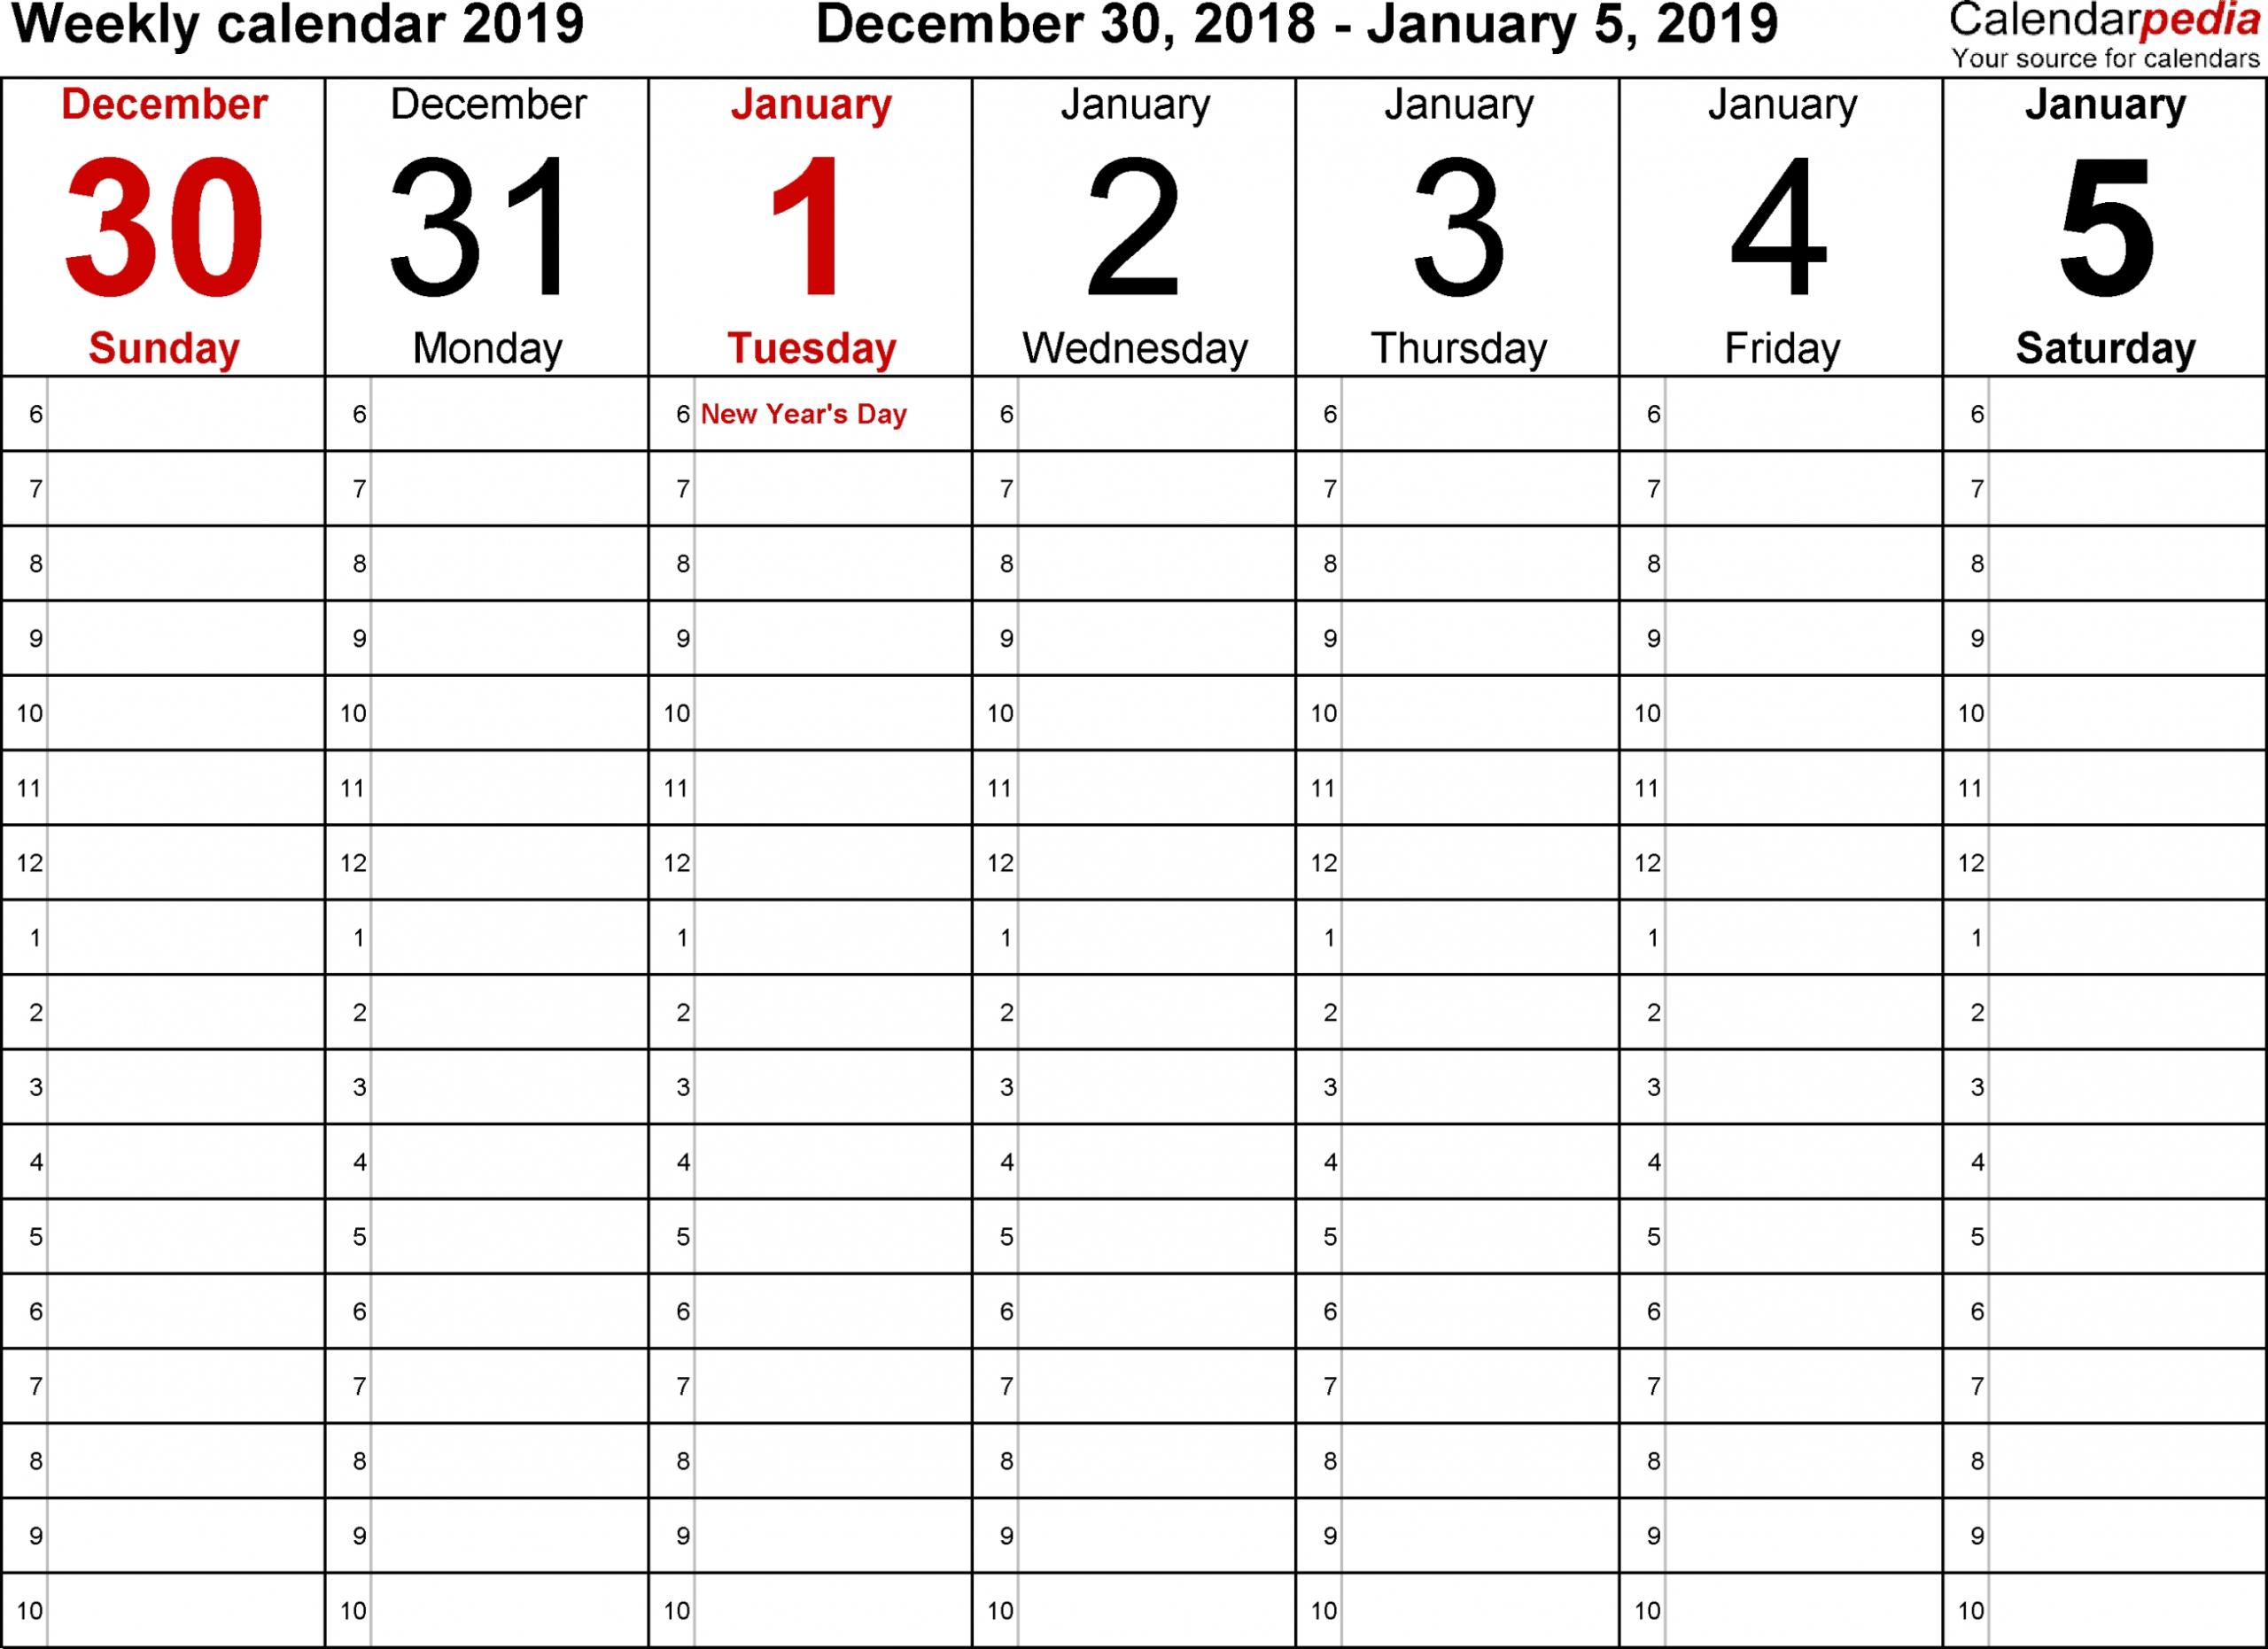 Daily Calendars Free Printable Editable - Calendar